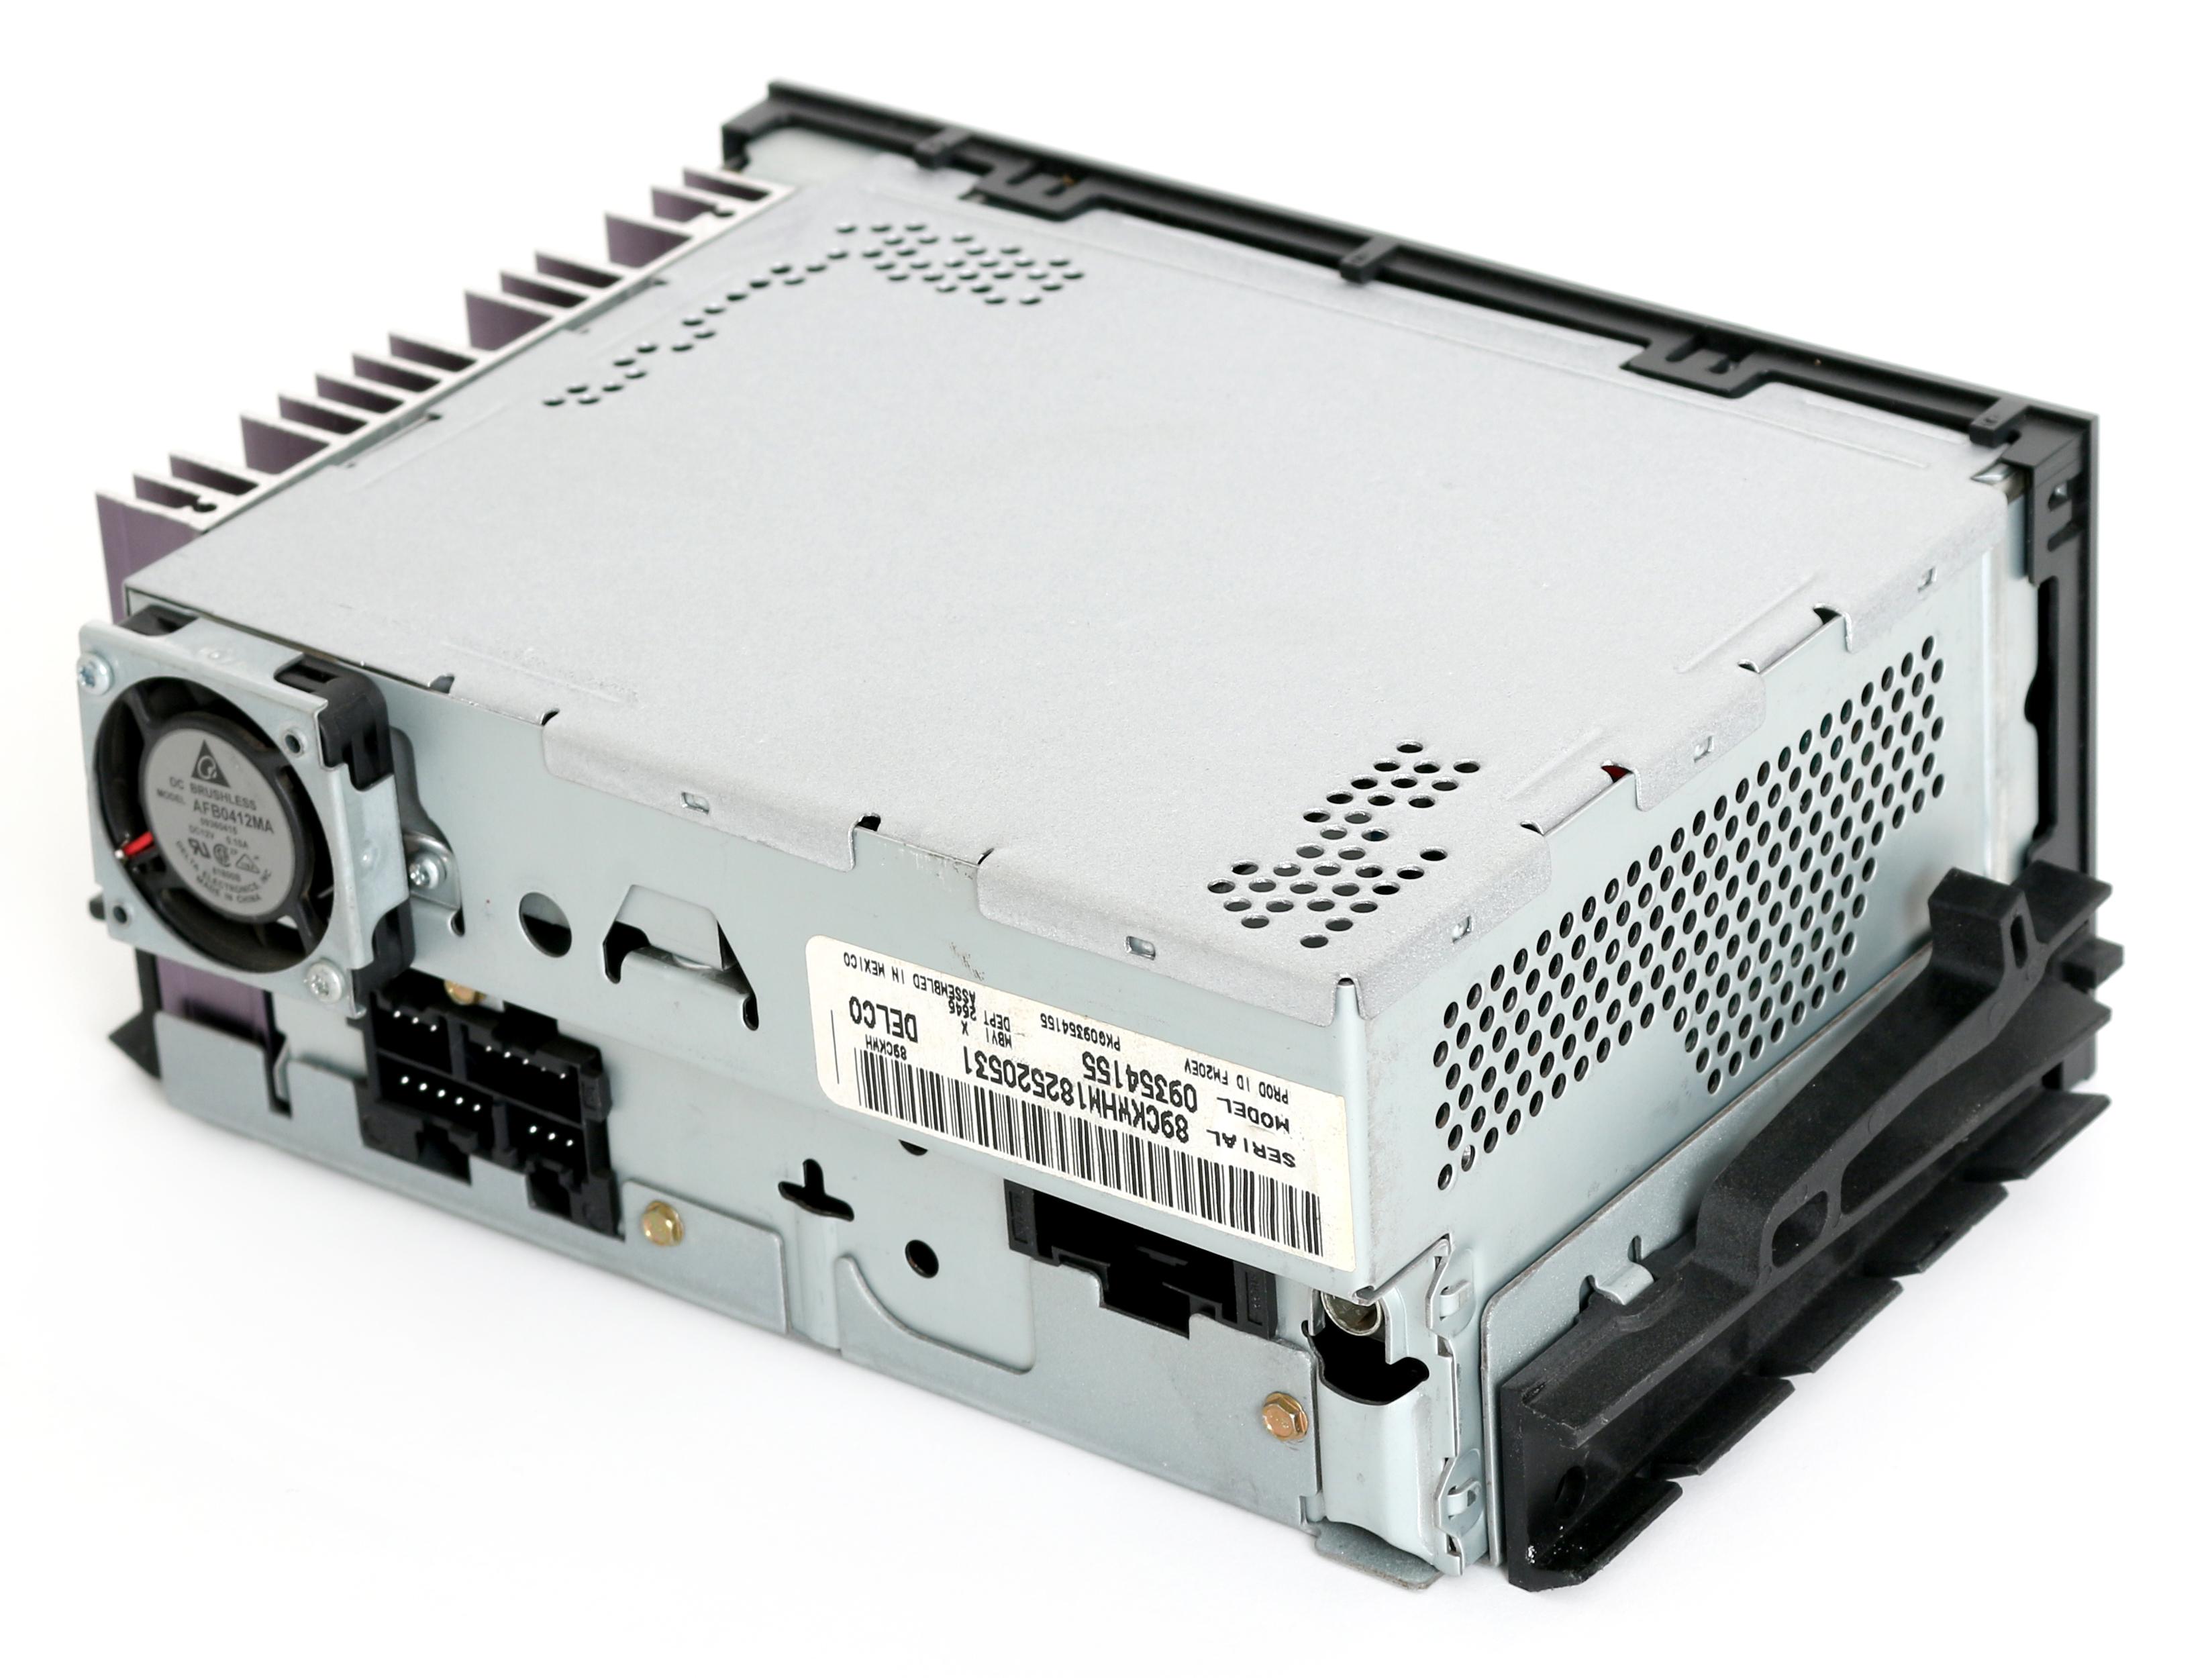 Delco Model 09354155 Wiring Diagram Starter 15071234 Radio 1995 2002 Gmc Chevy Truck Van Gm Am Fm Cassette Player Alternator